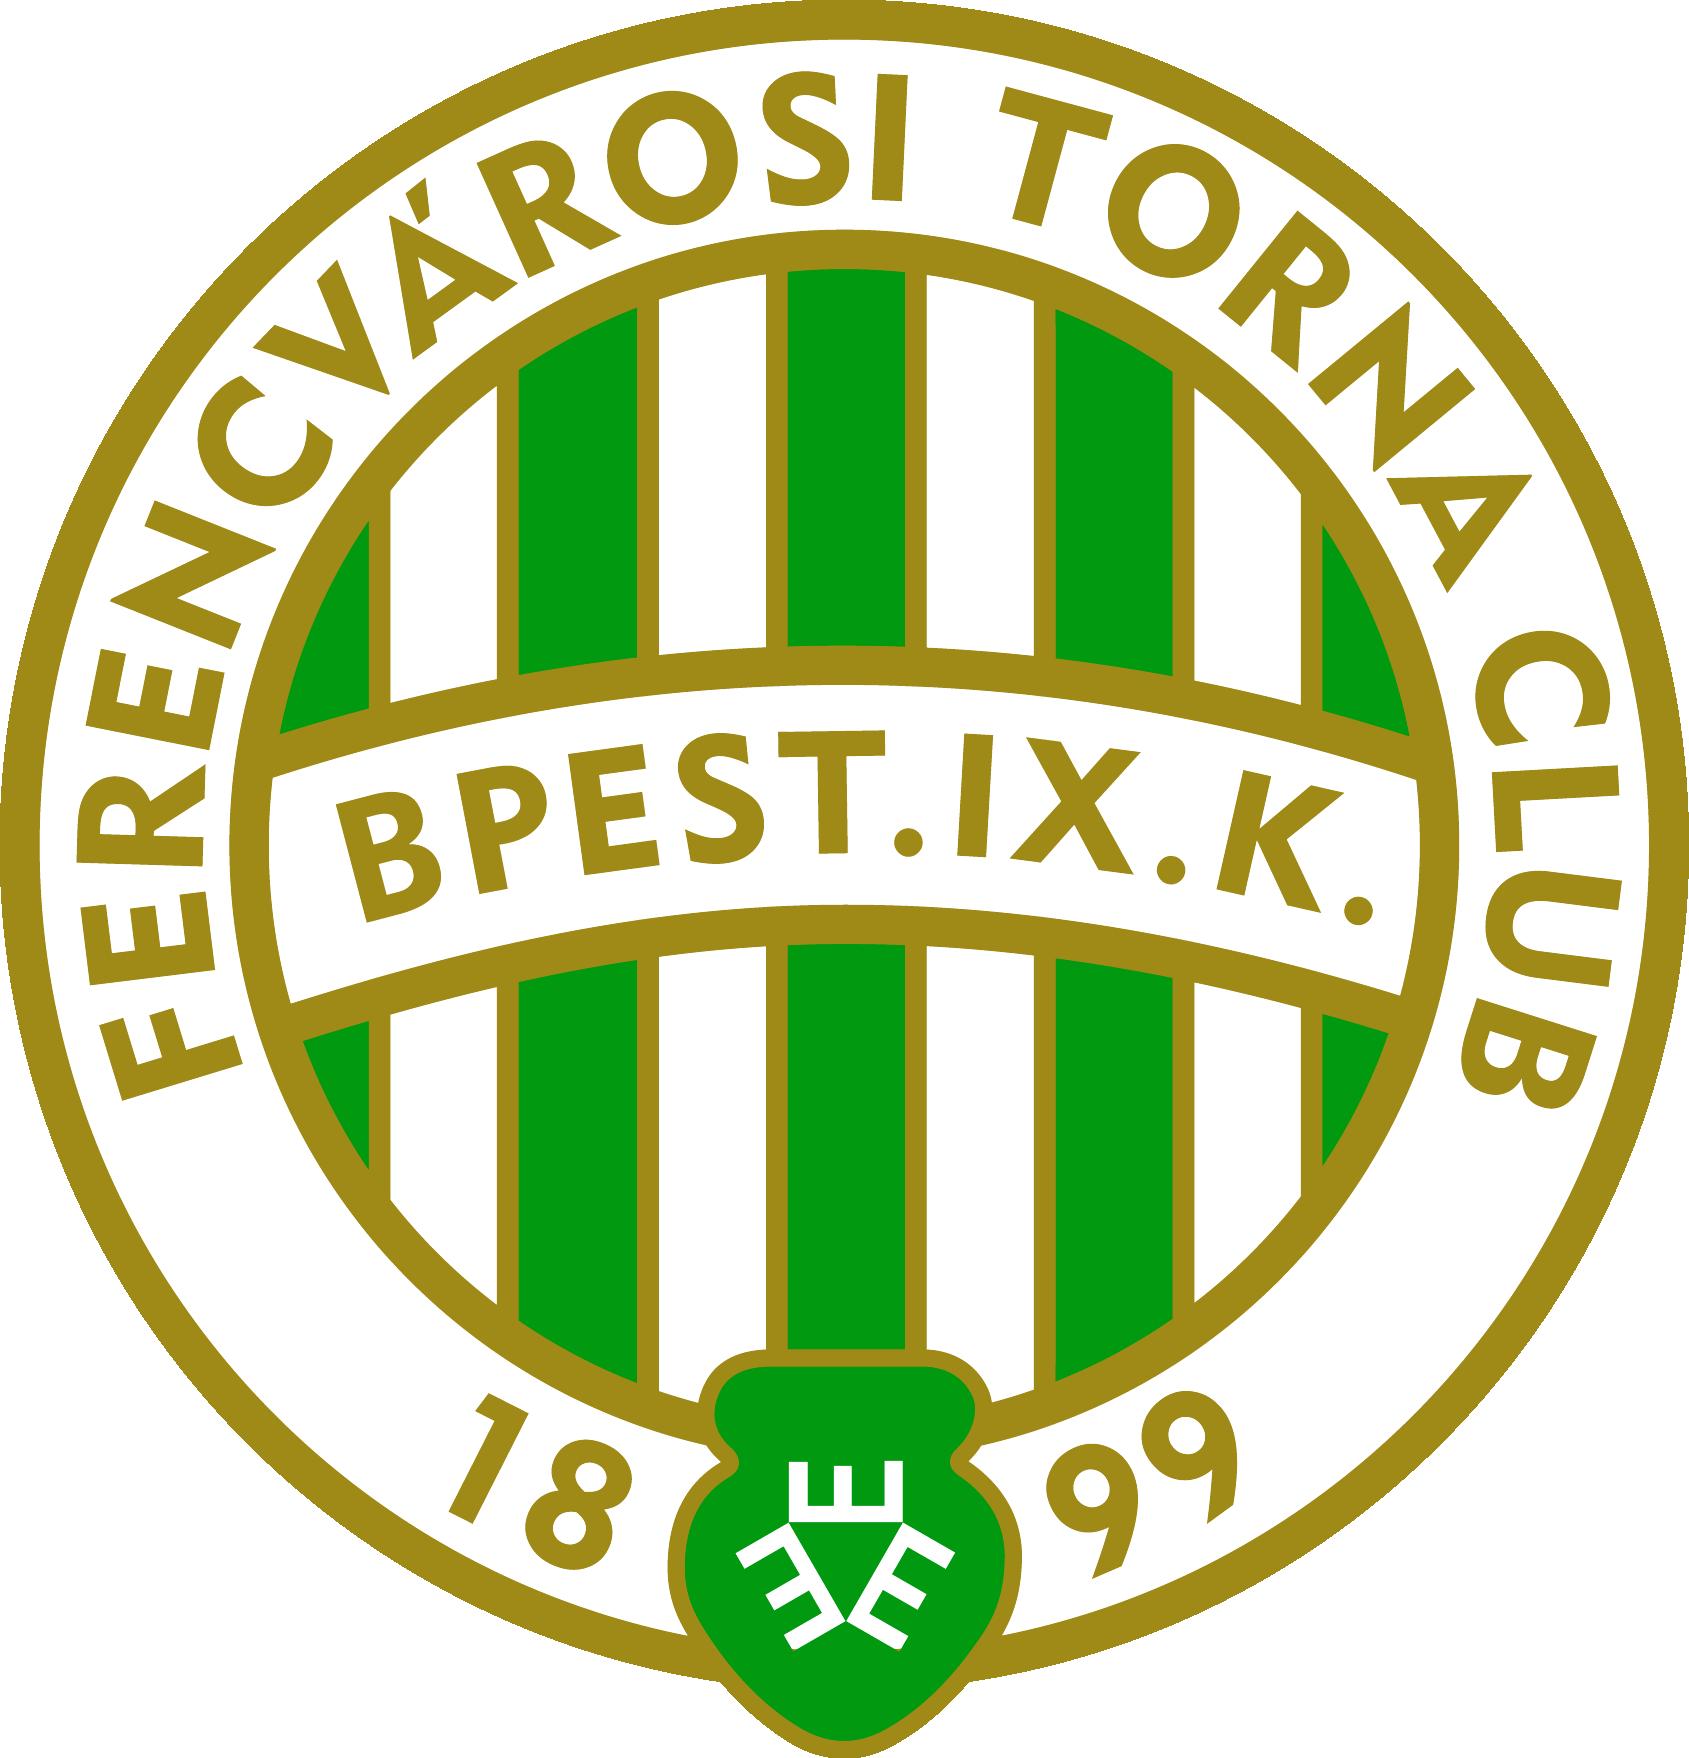 Ferencvarosi Tc Ferencvarosi Torna Club European Football Football Club